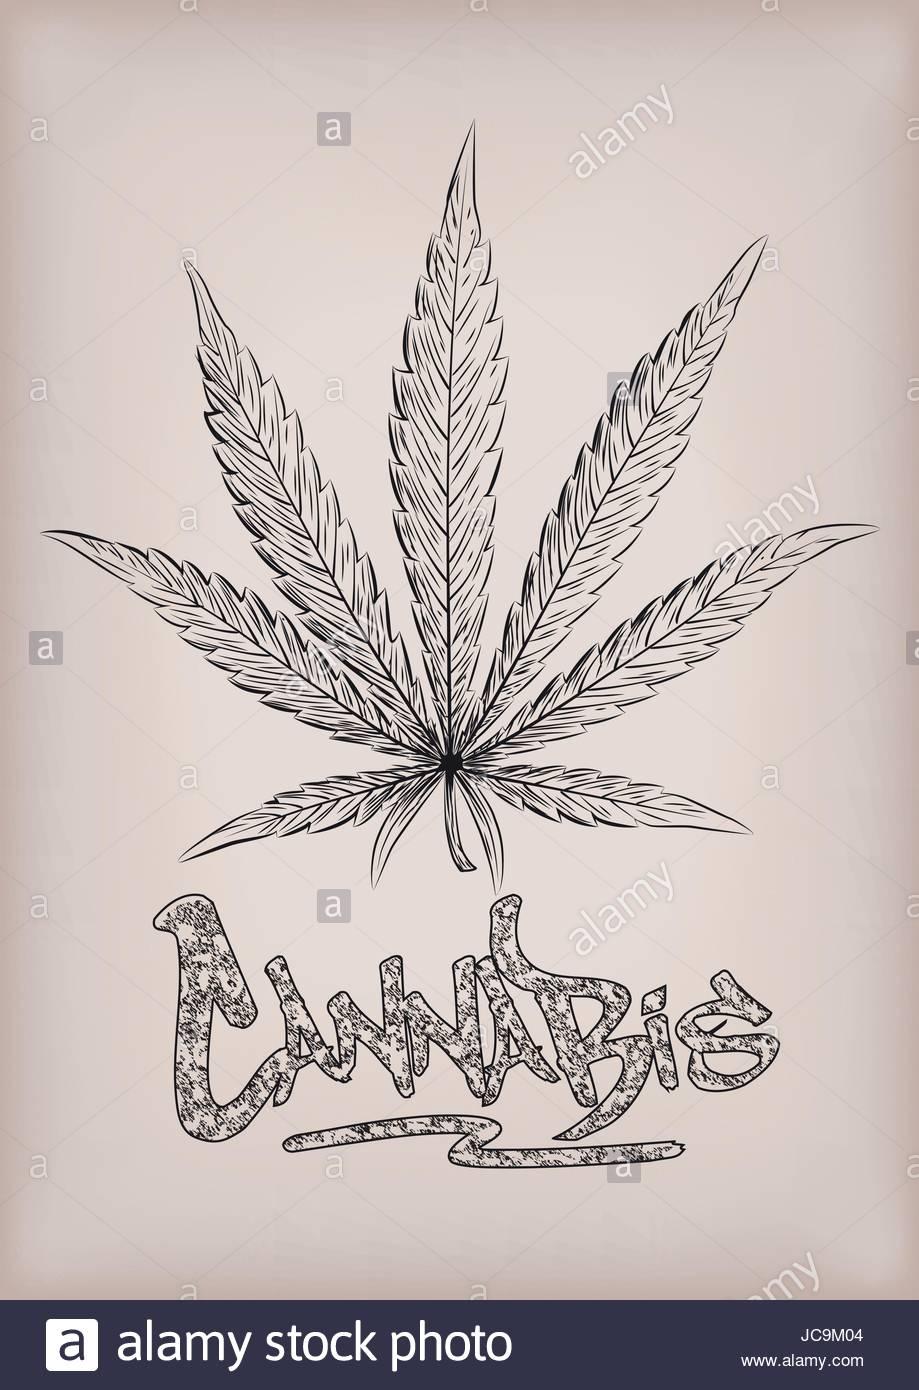 919x1390 Cannabis Marijuana Weed Leaf Silhouette Narcotic Drug Plant